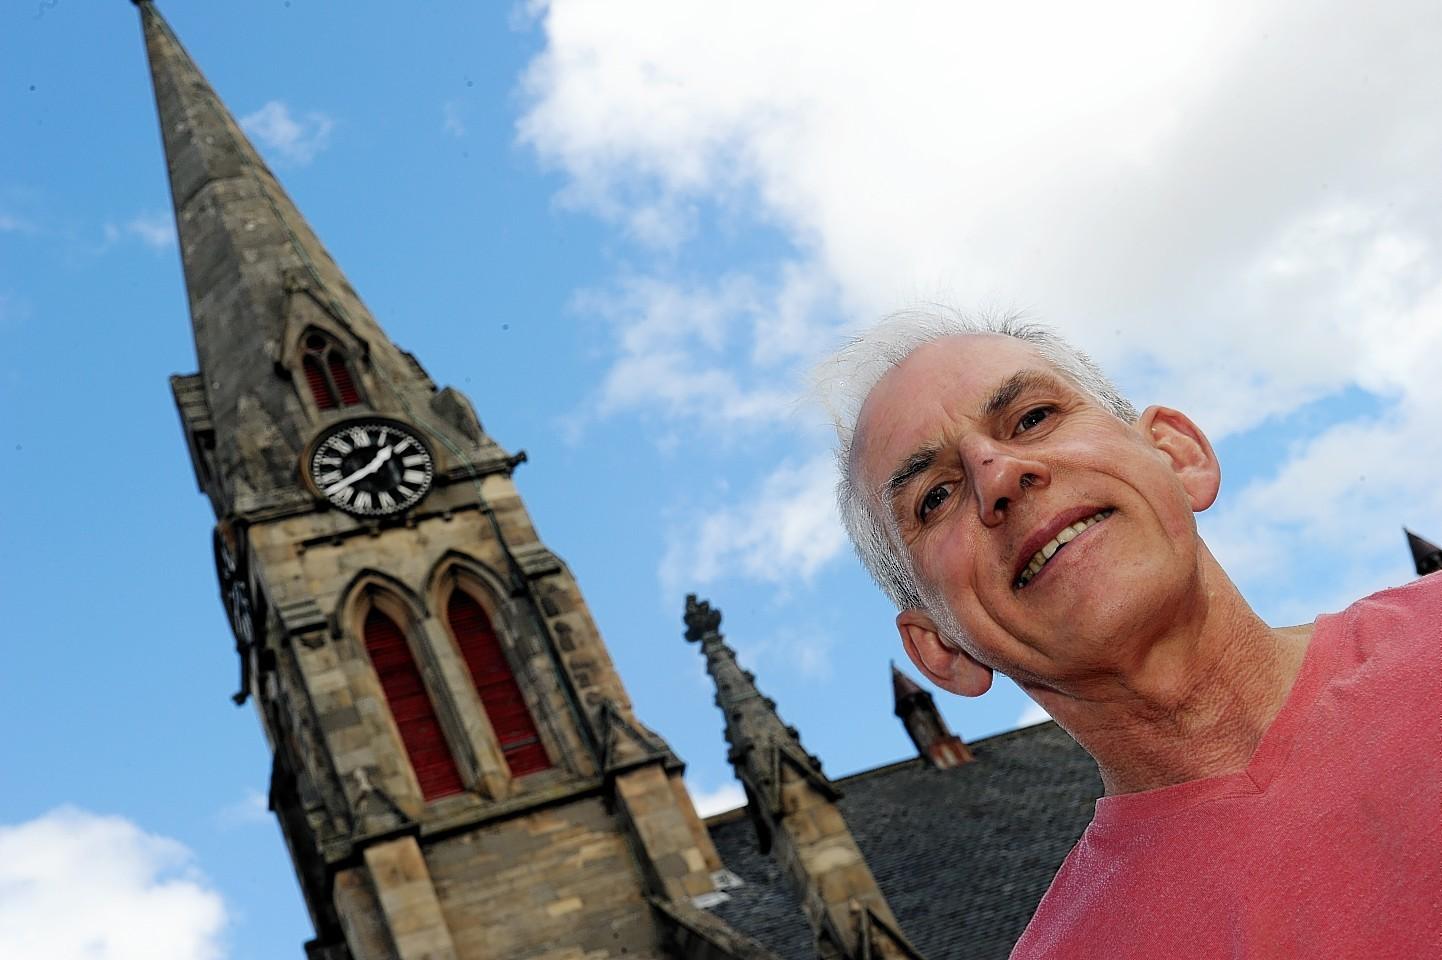 Ali MacDonald has attempted to repair one of the tower clocks in Elgin